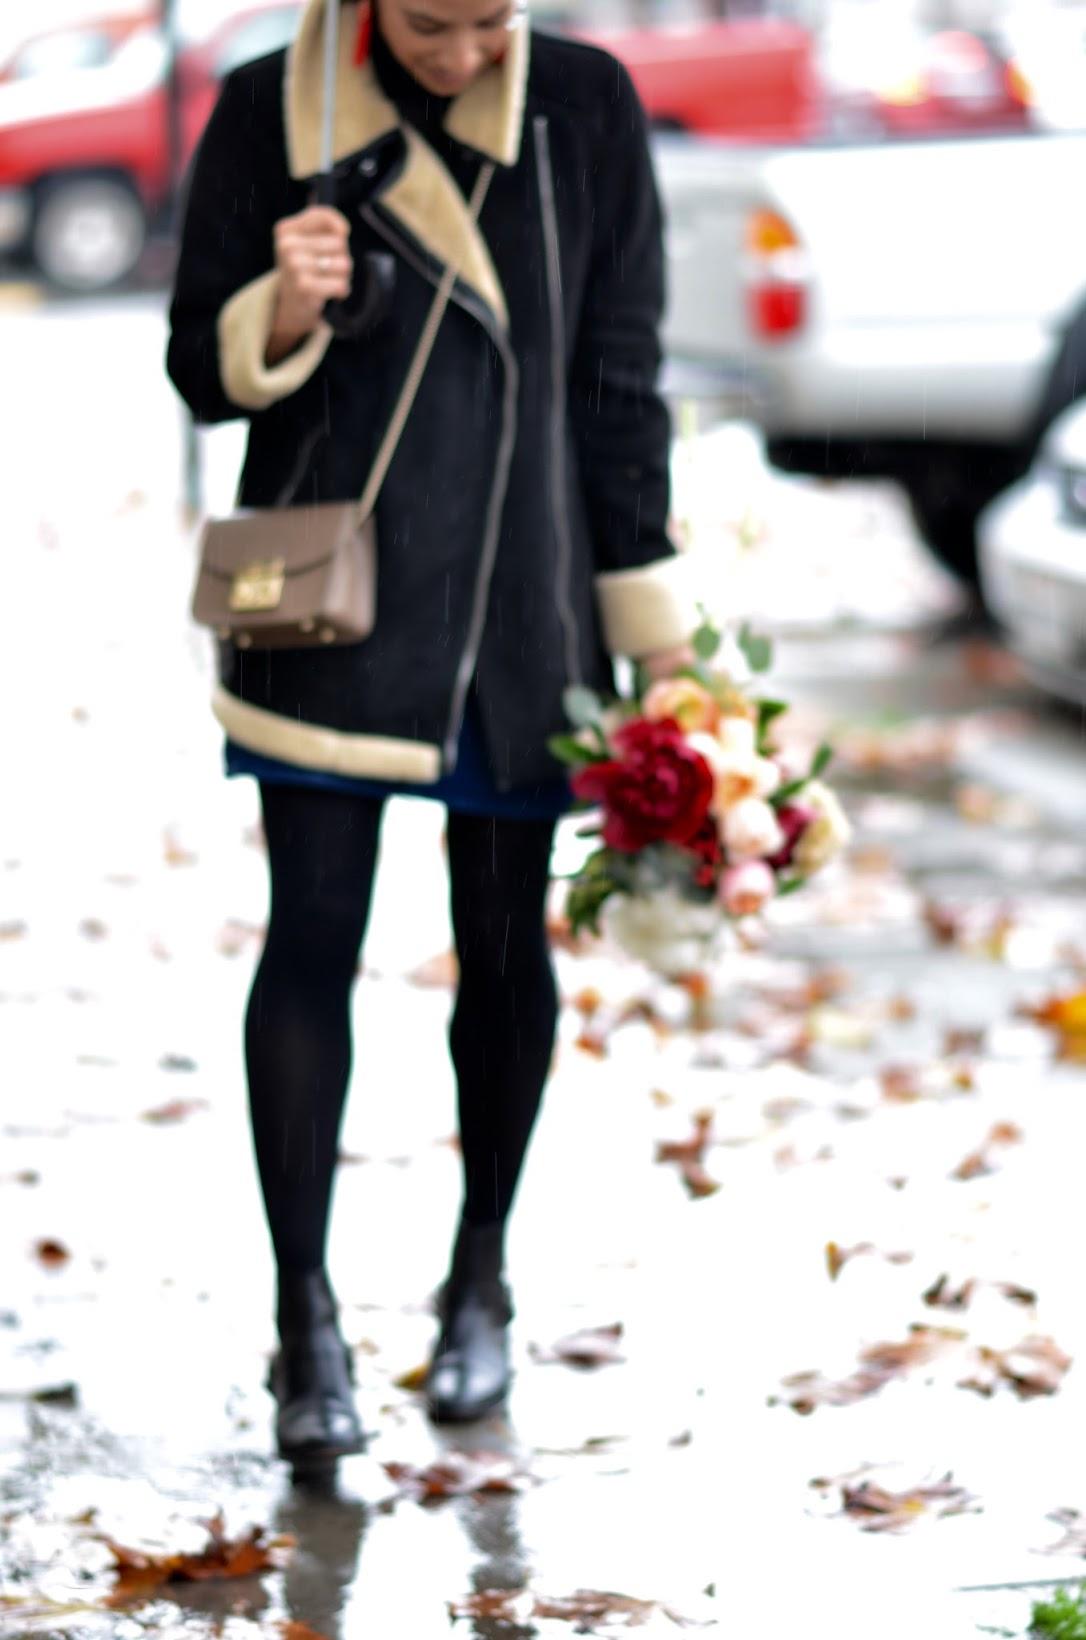 rainy day style, zara winter 2016, winter florals, peonies, winter peonies, Furla crossbody, BaubleBar piñata earrings, clear bubble umbrella